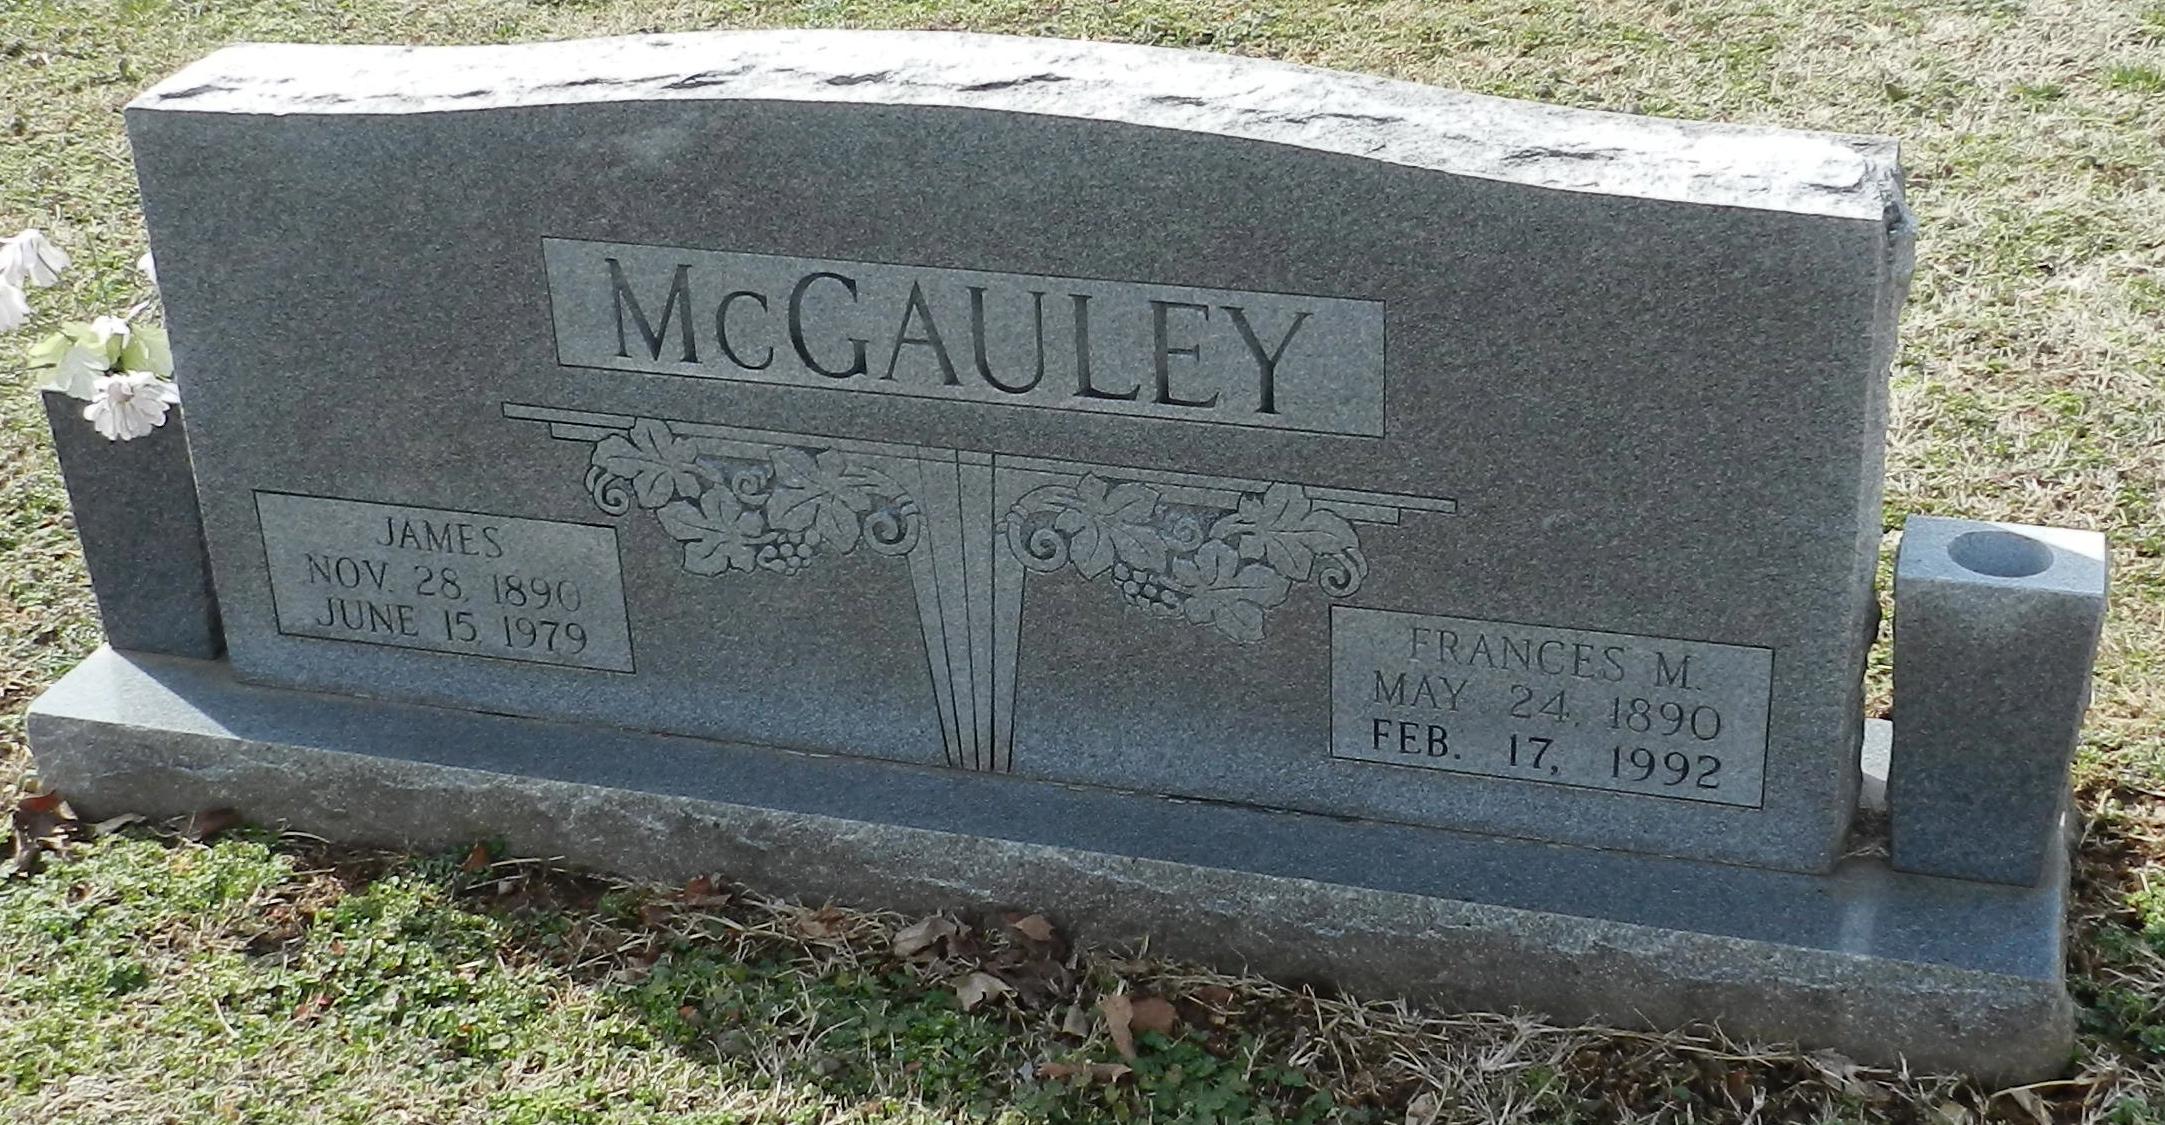 James McGauley